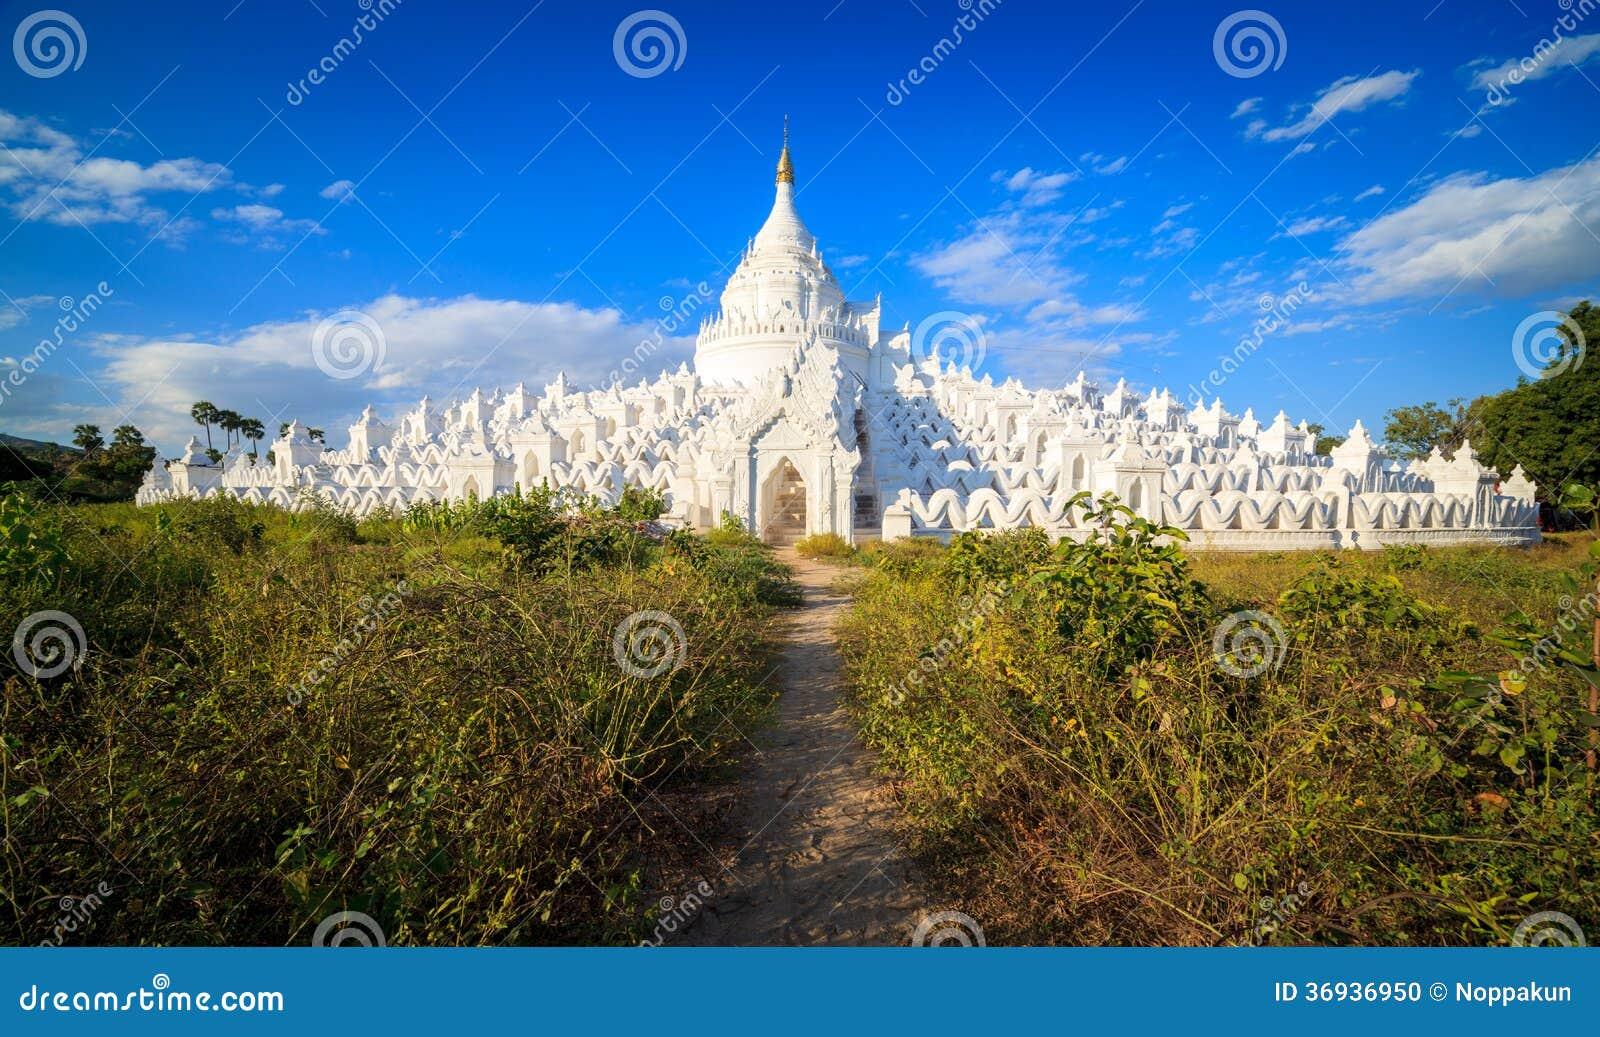 Panorama von Hsinbyume-Pagode, Mingun, Mandalay, Myanmar